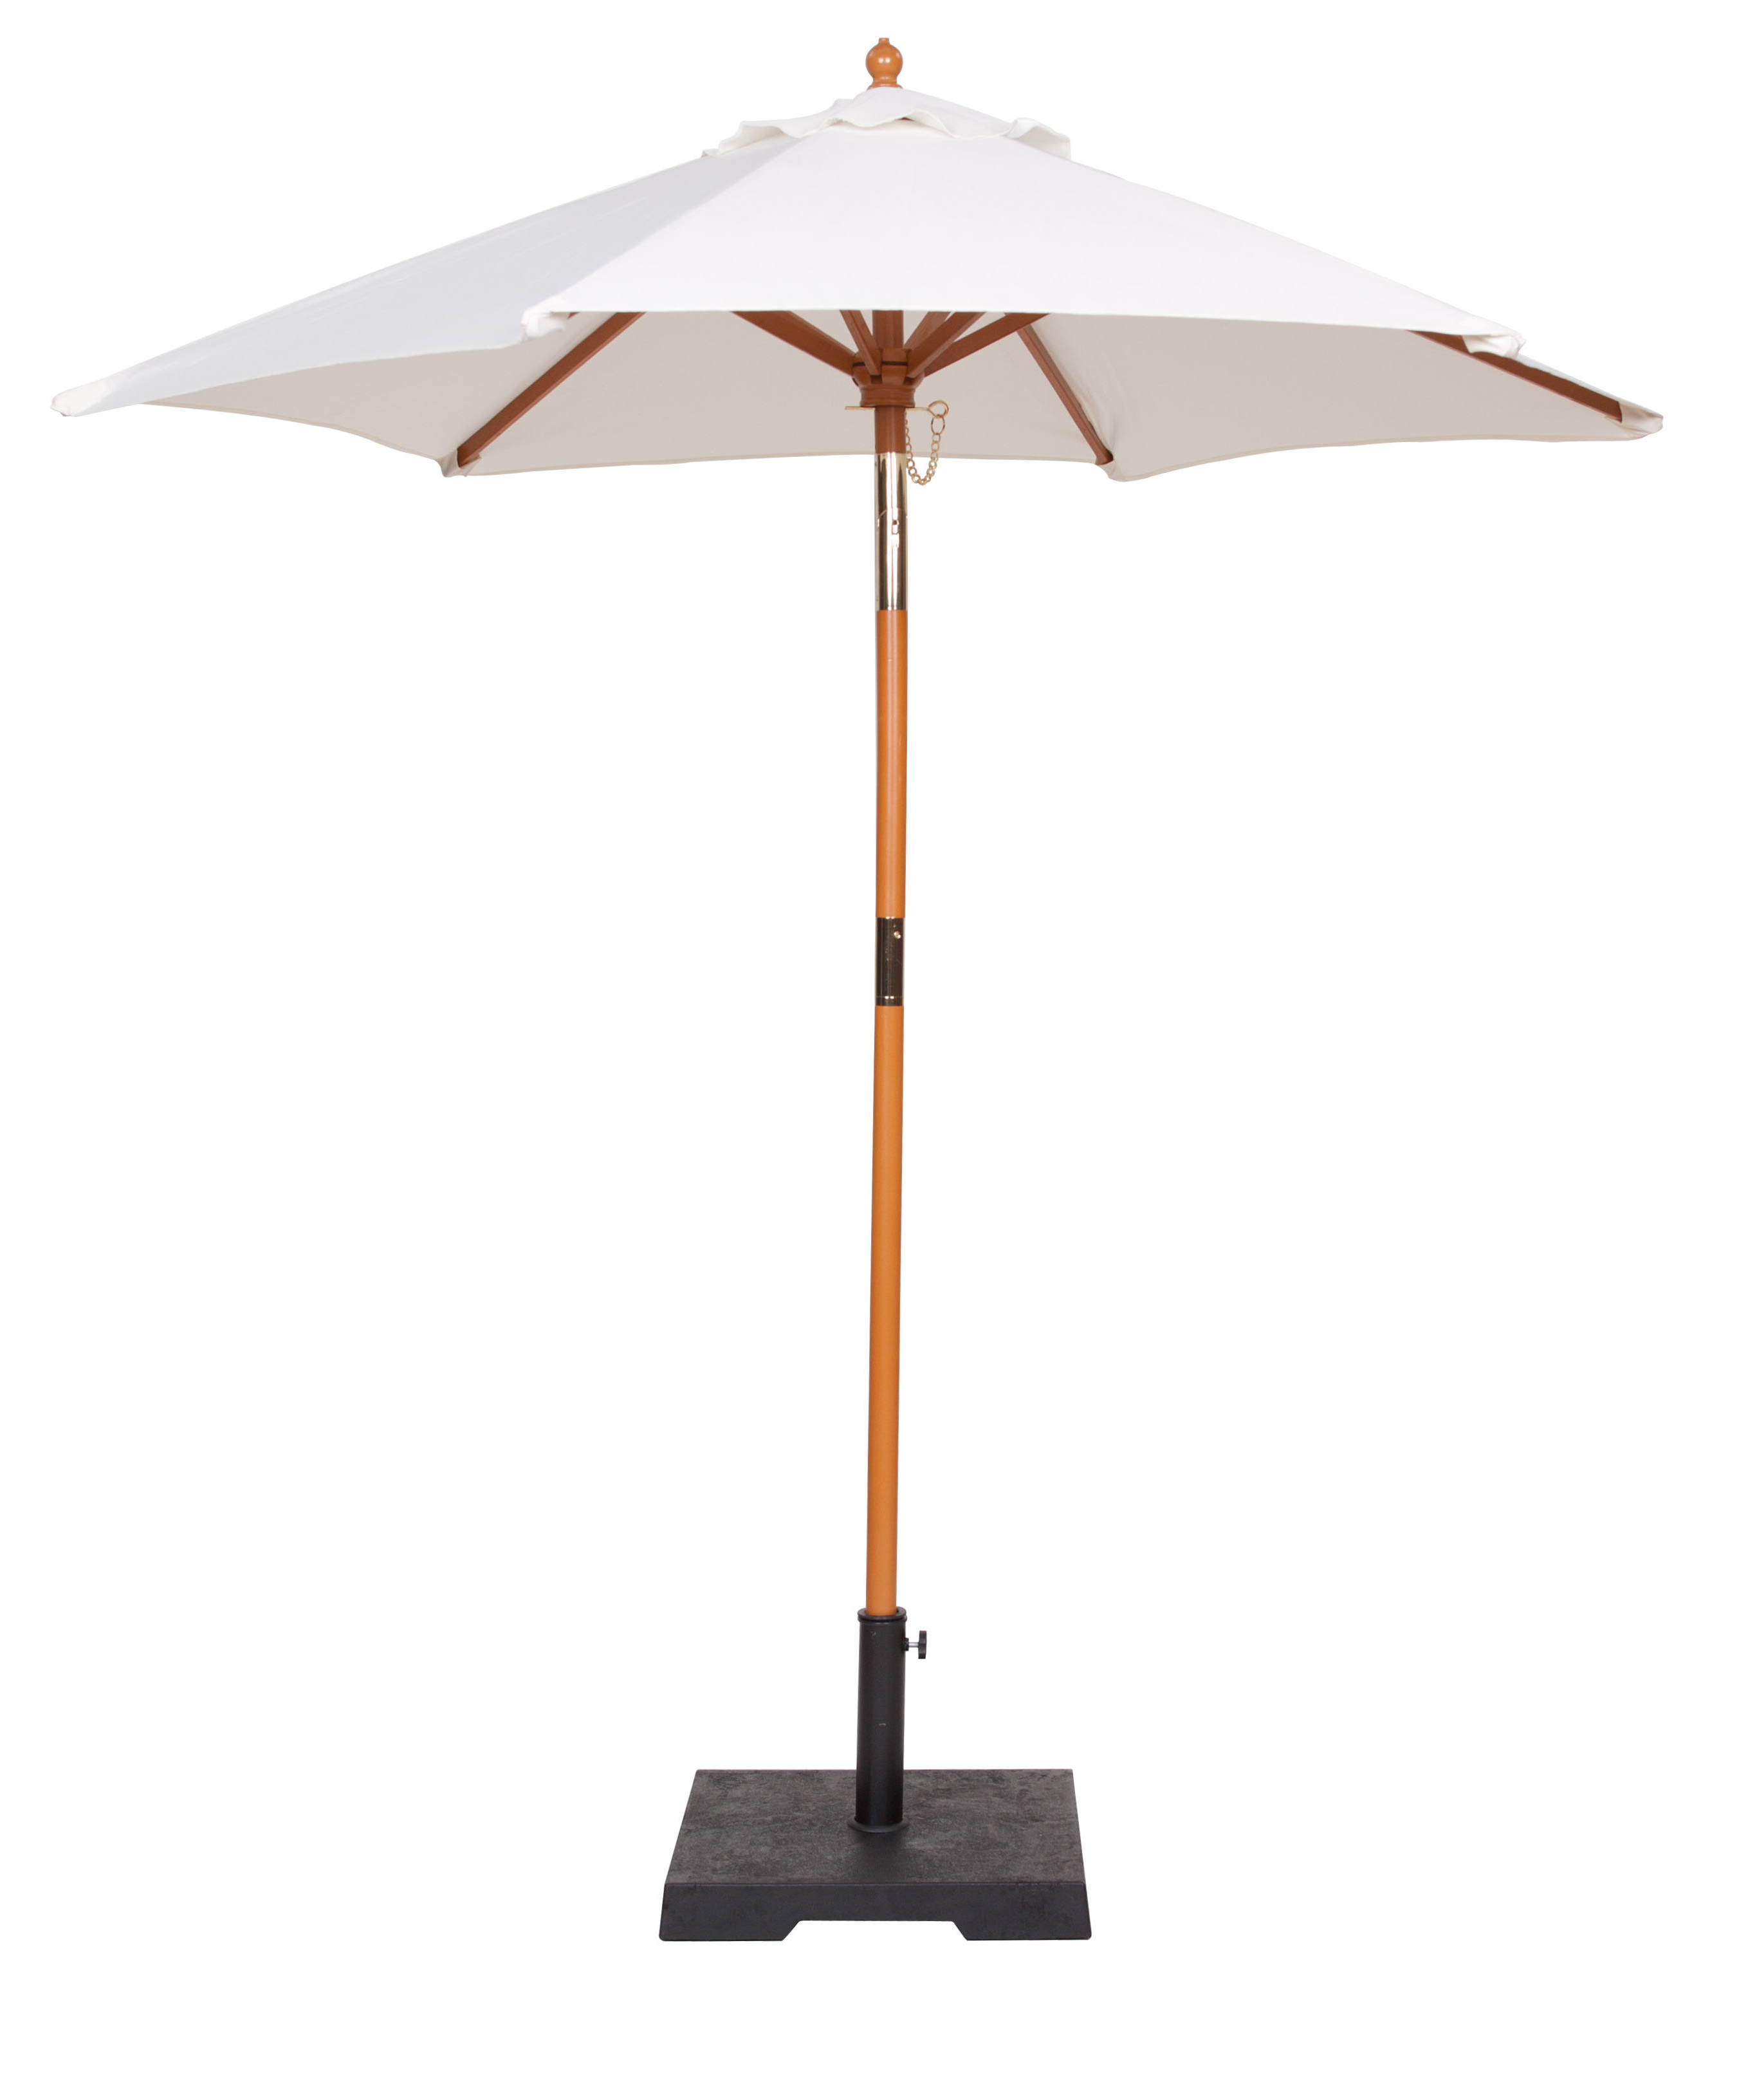 2020 Shropshire Market Umbrella Within Devansh Market Umbrellas (View 3 of 20)